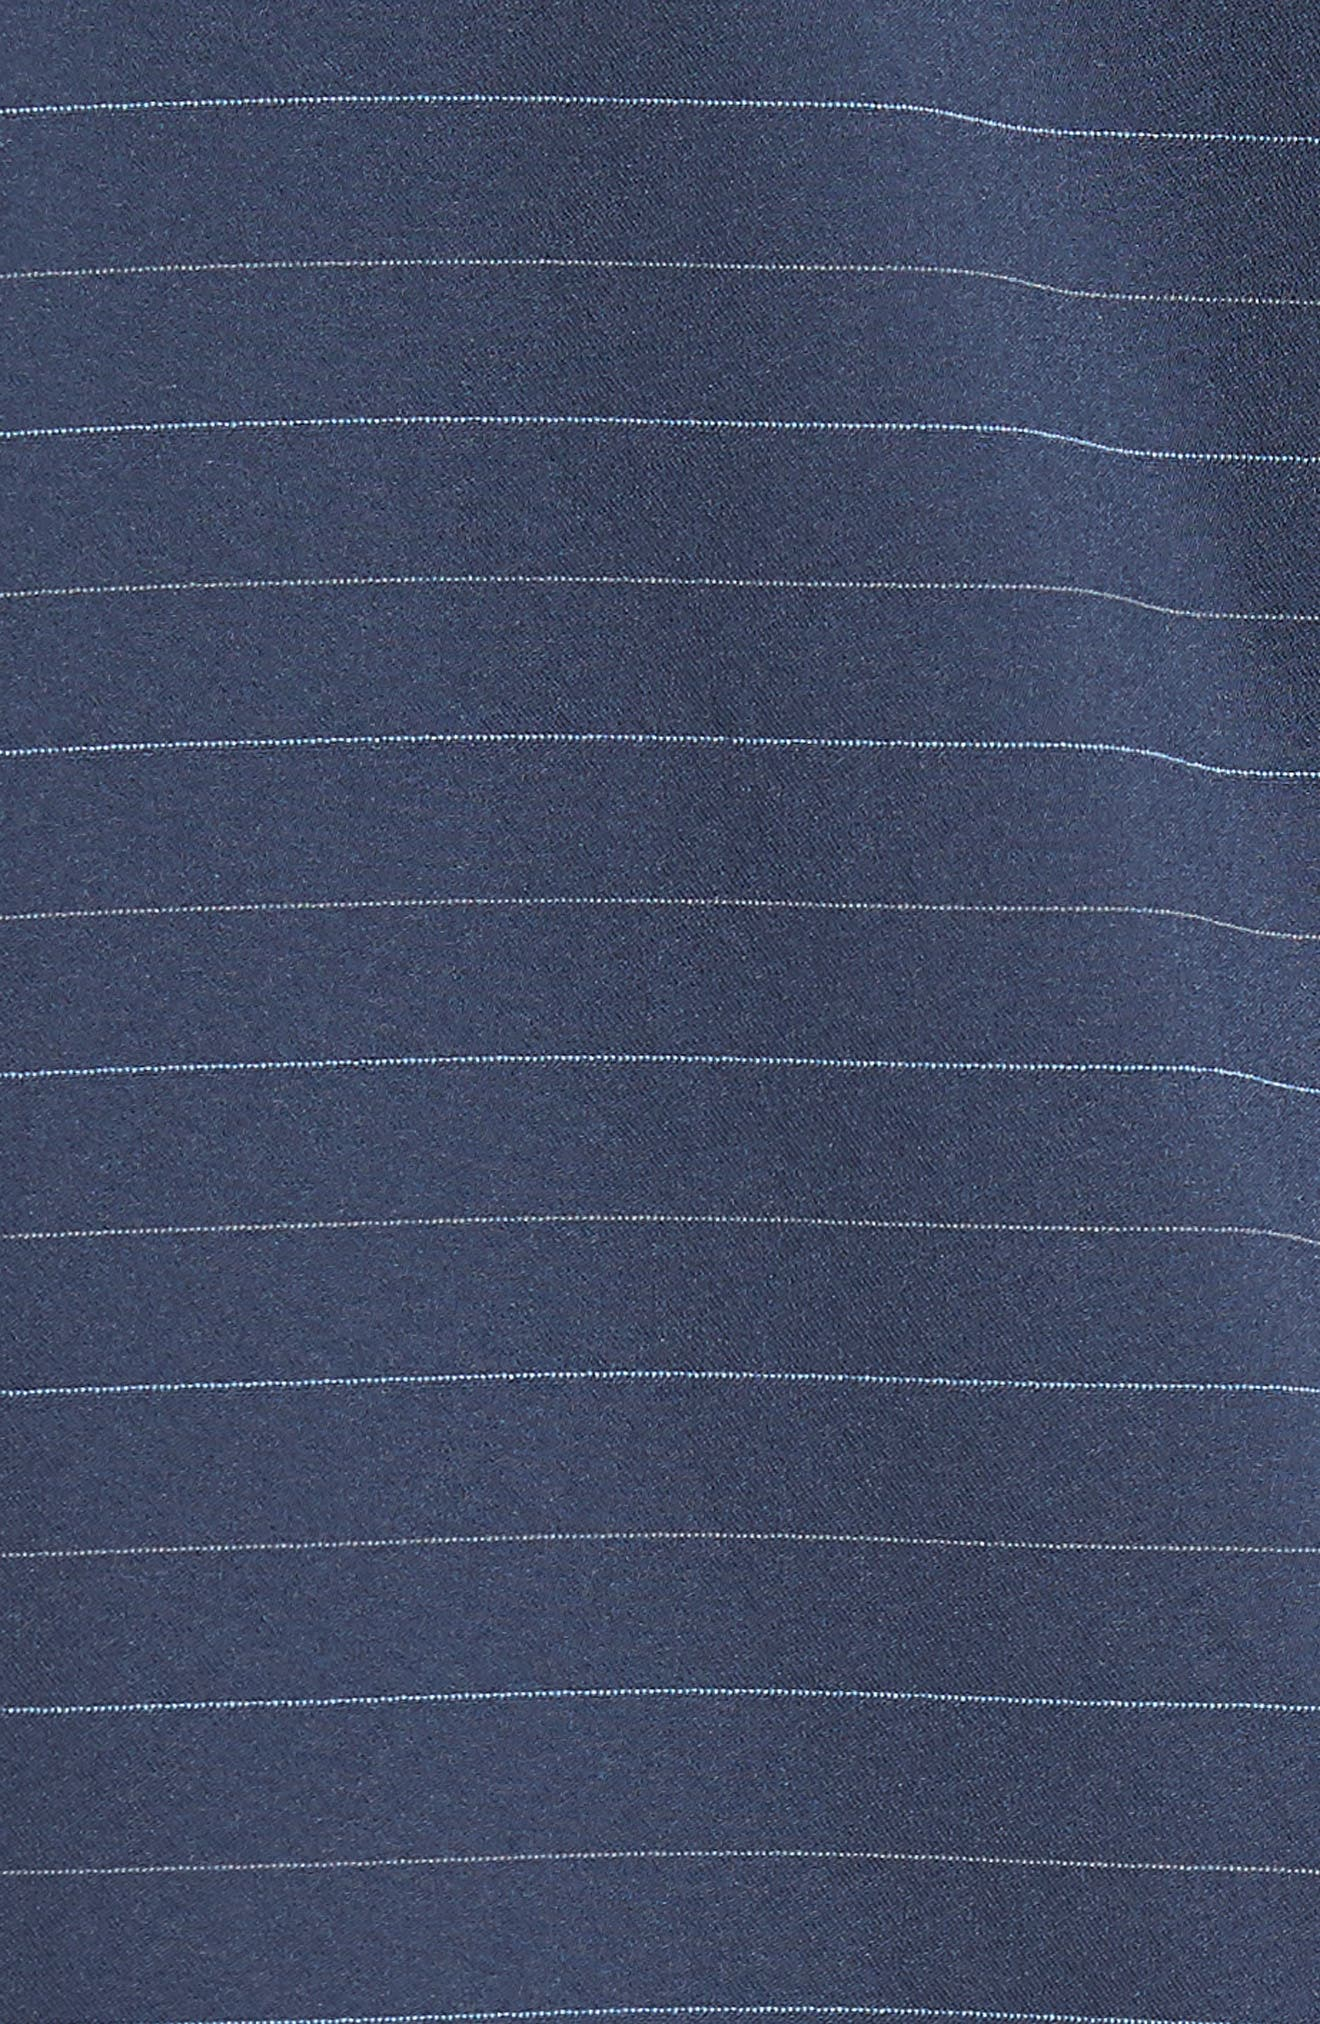 Vagabond Regular Fit Sport Shirt,                             Alternate thumbnail 5, color,                             HEATHER BLUE NIGHTS